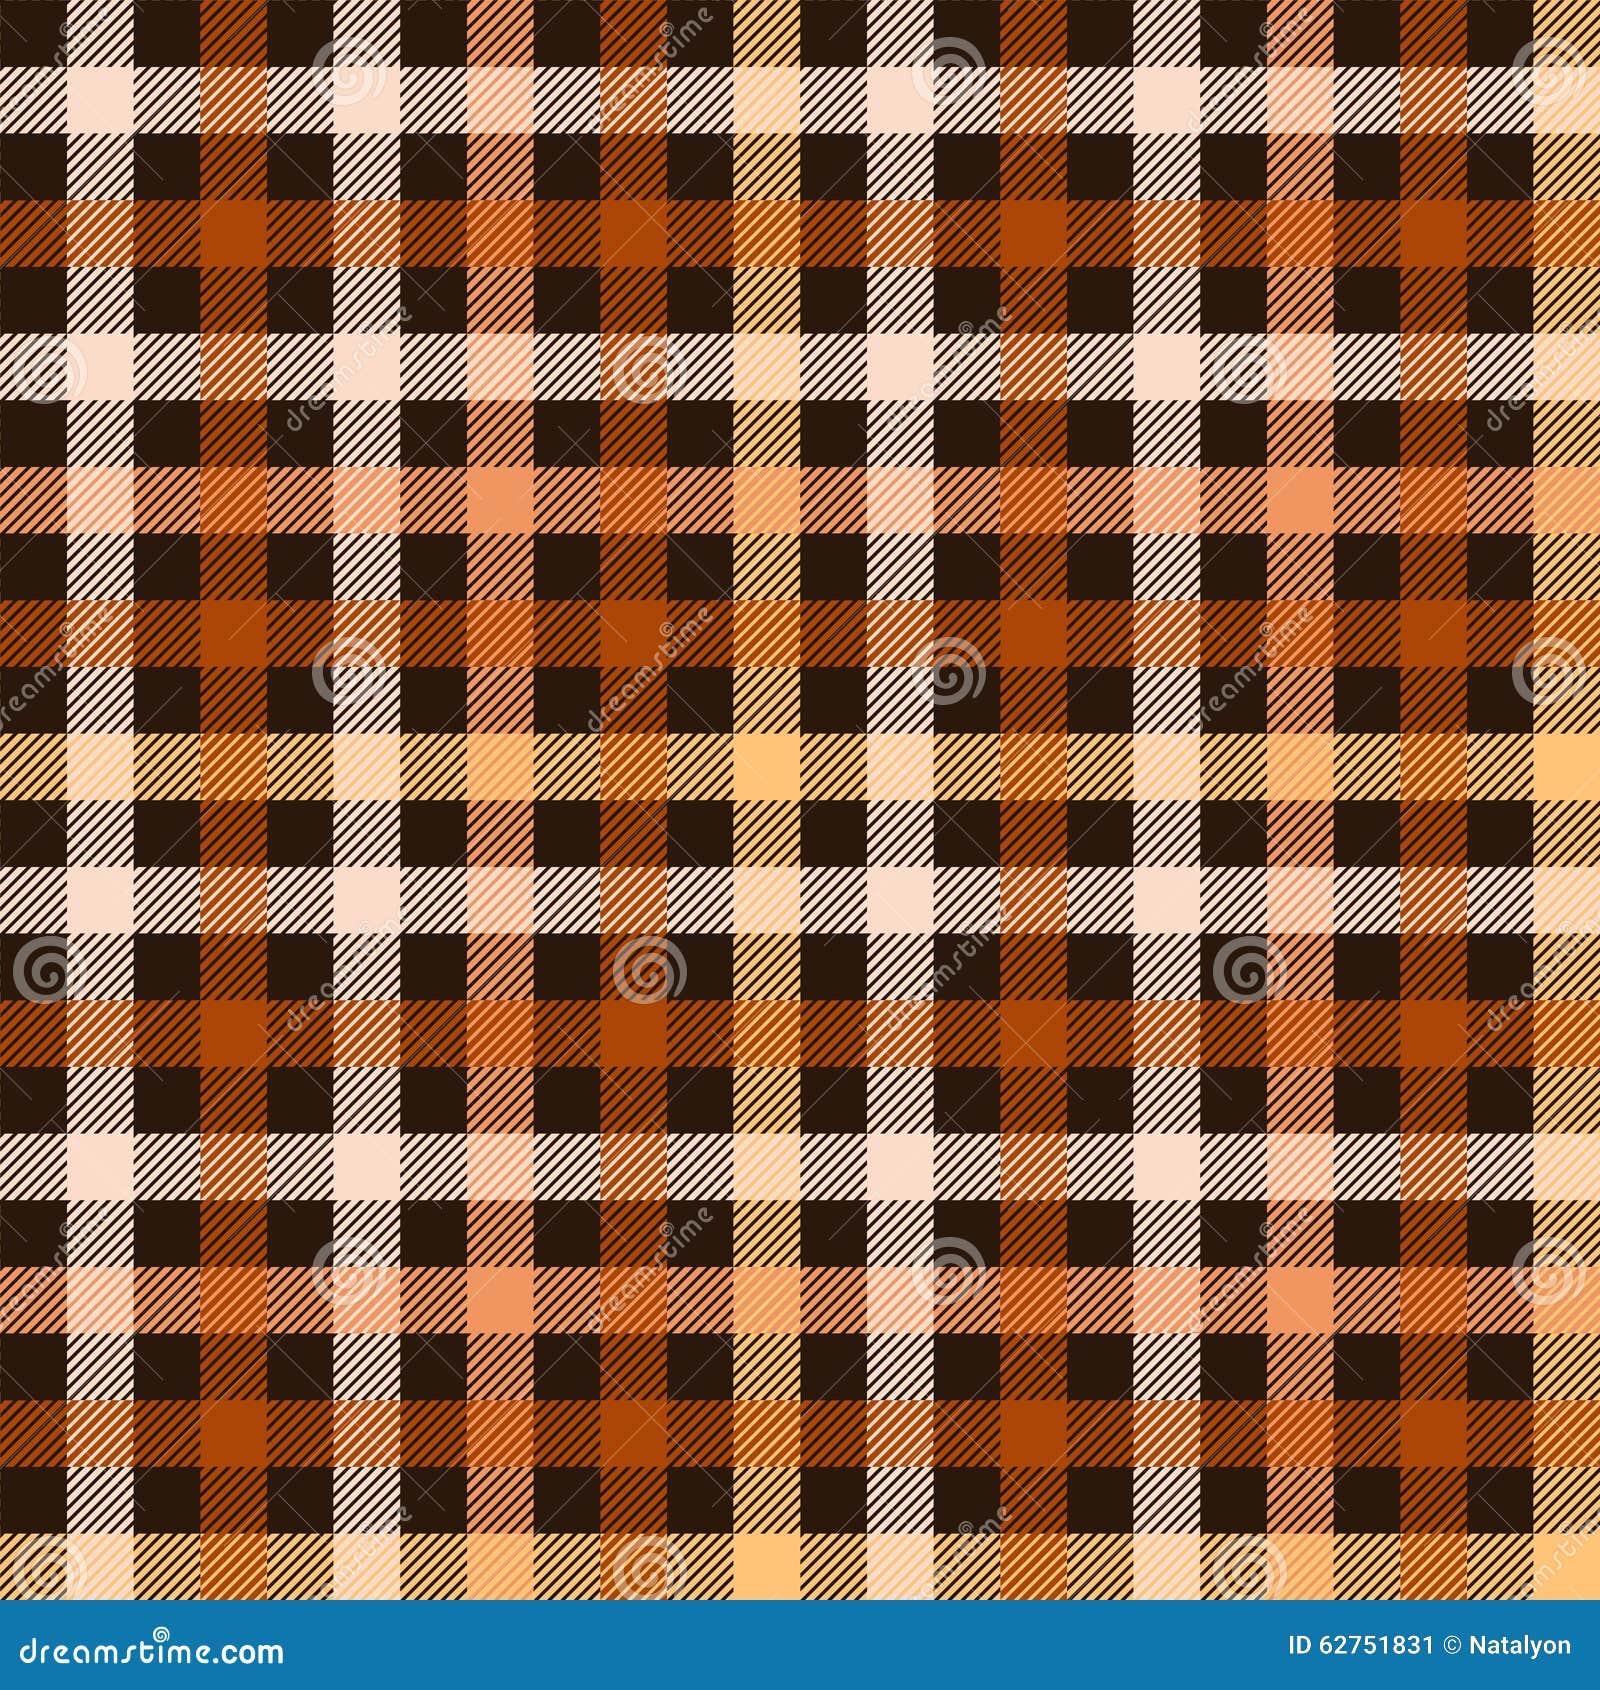 Checkered Design Checkered Tartan Fabric Seamless Pattern In Brown And Orange